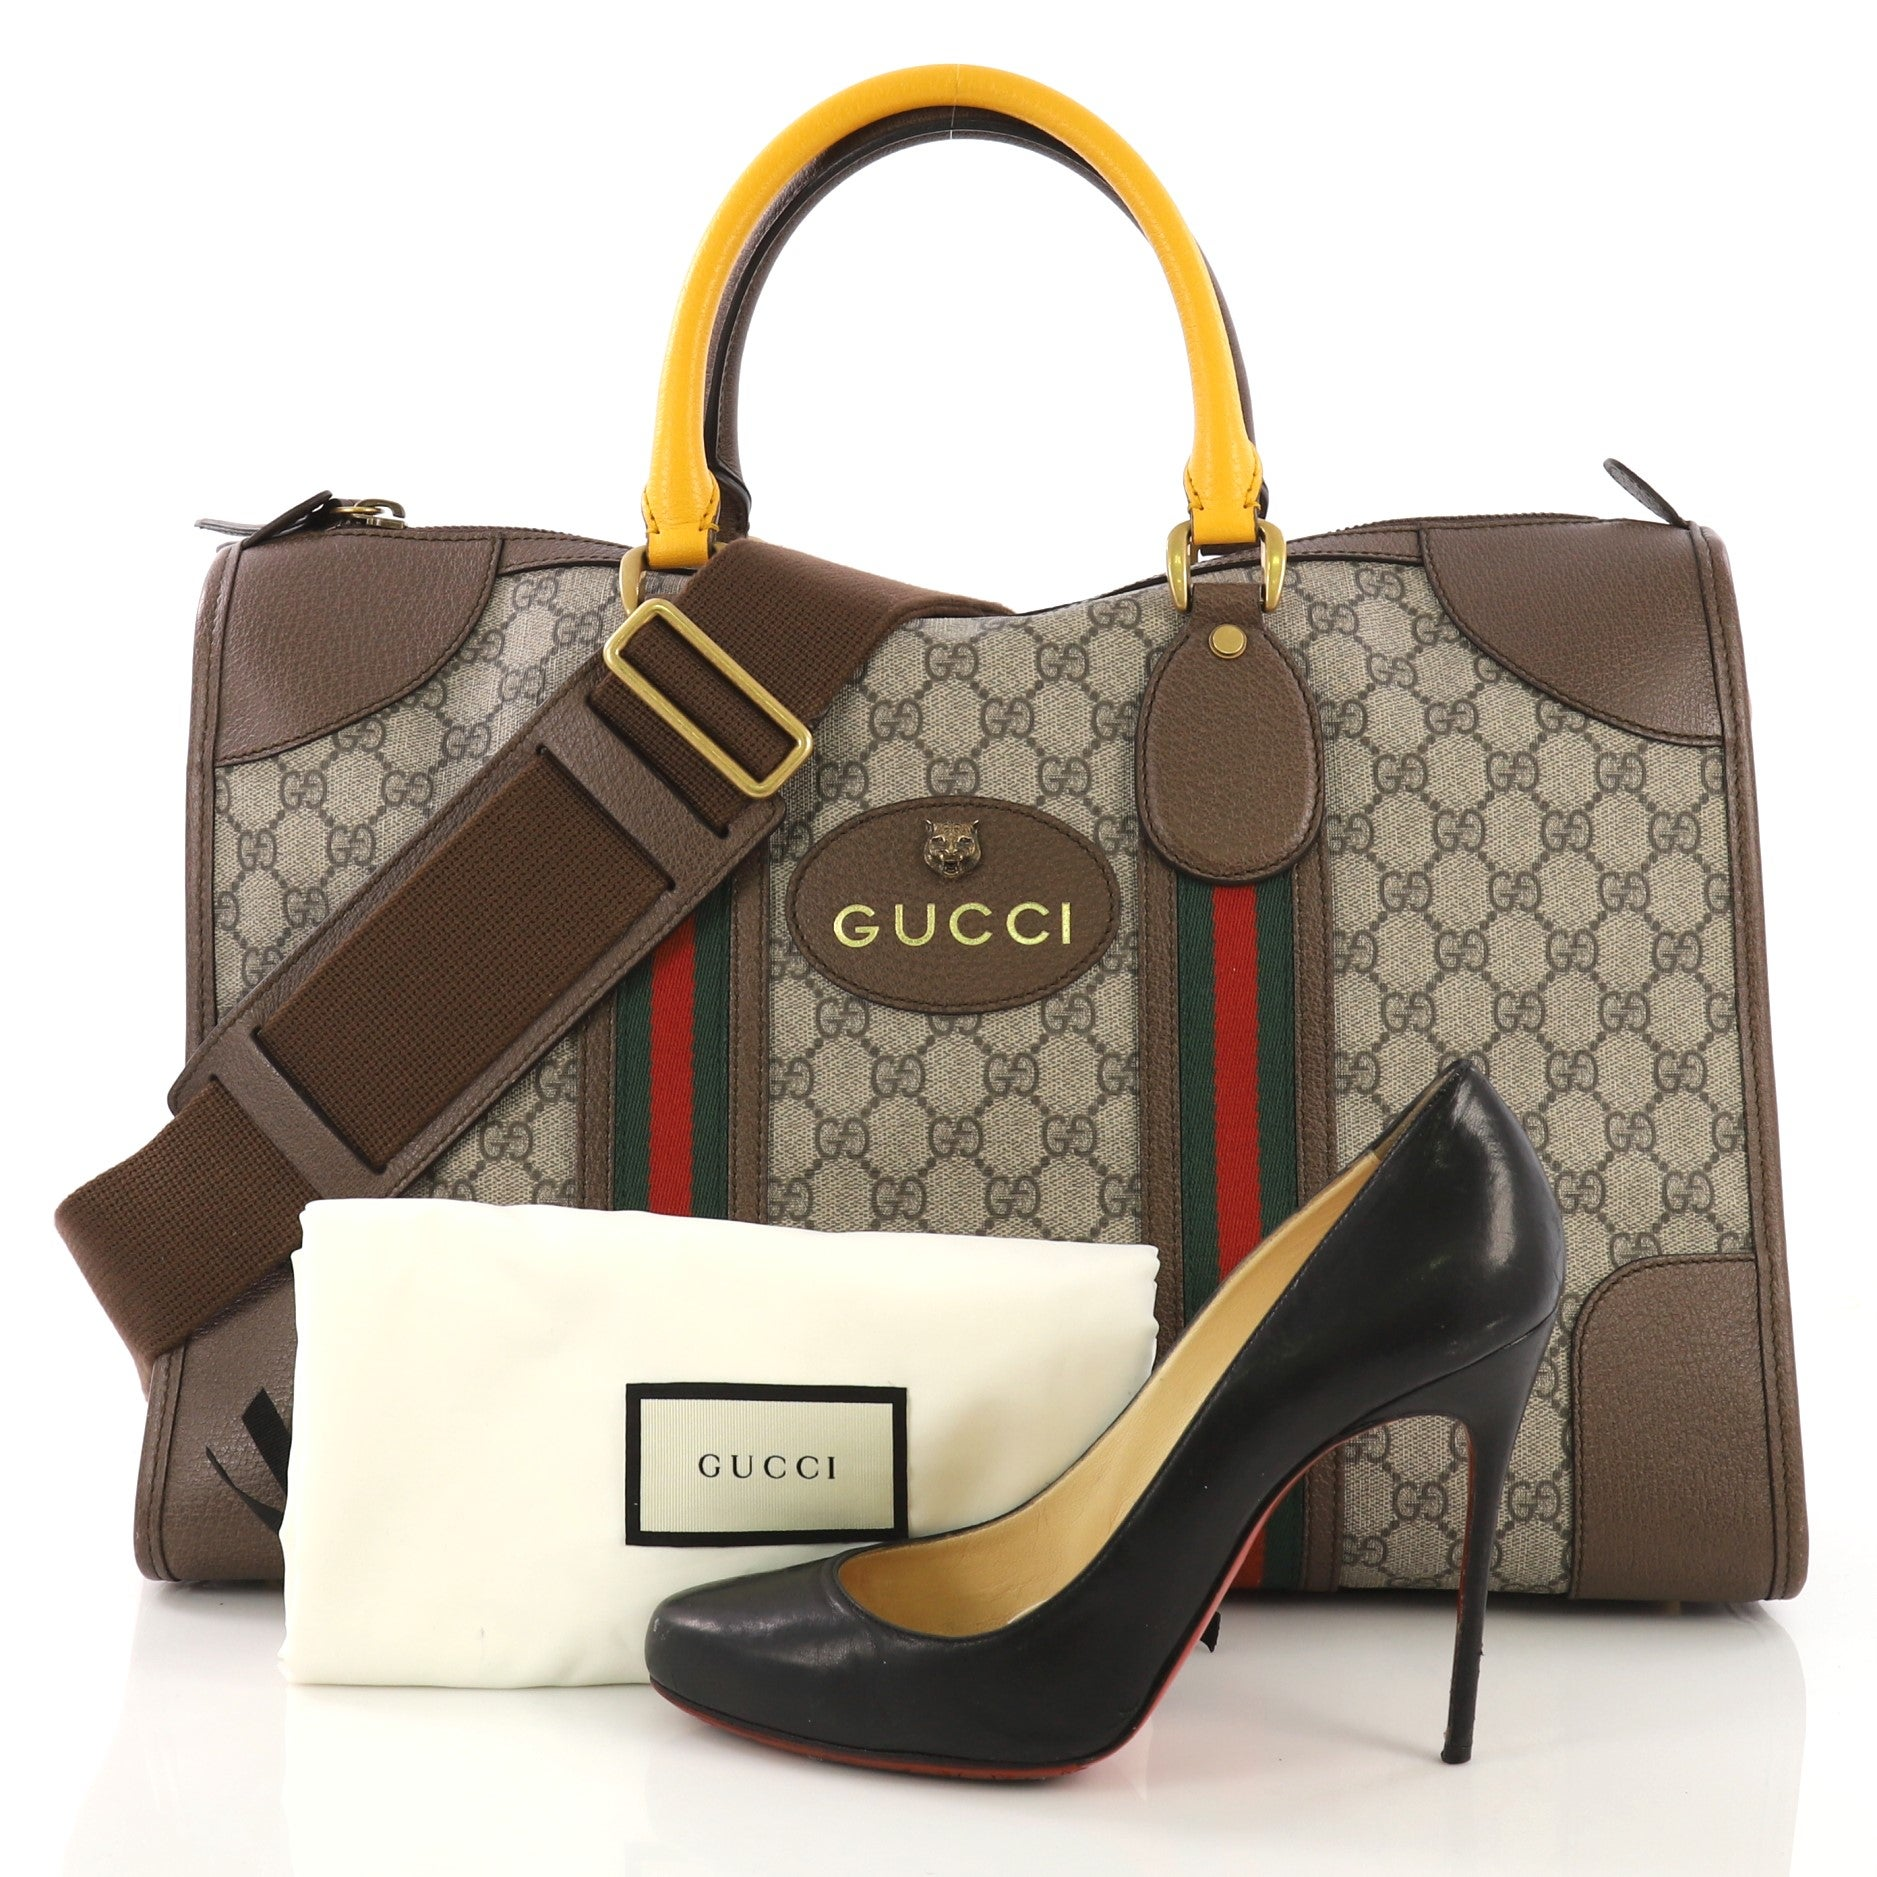 acc4d0980 Gucci Web Convertible Duffle Bag GG Coated Canvas Medium at 1stdibs